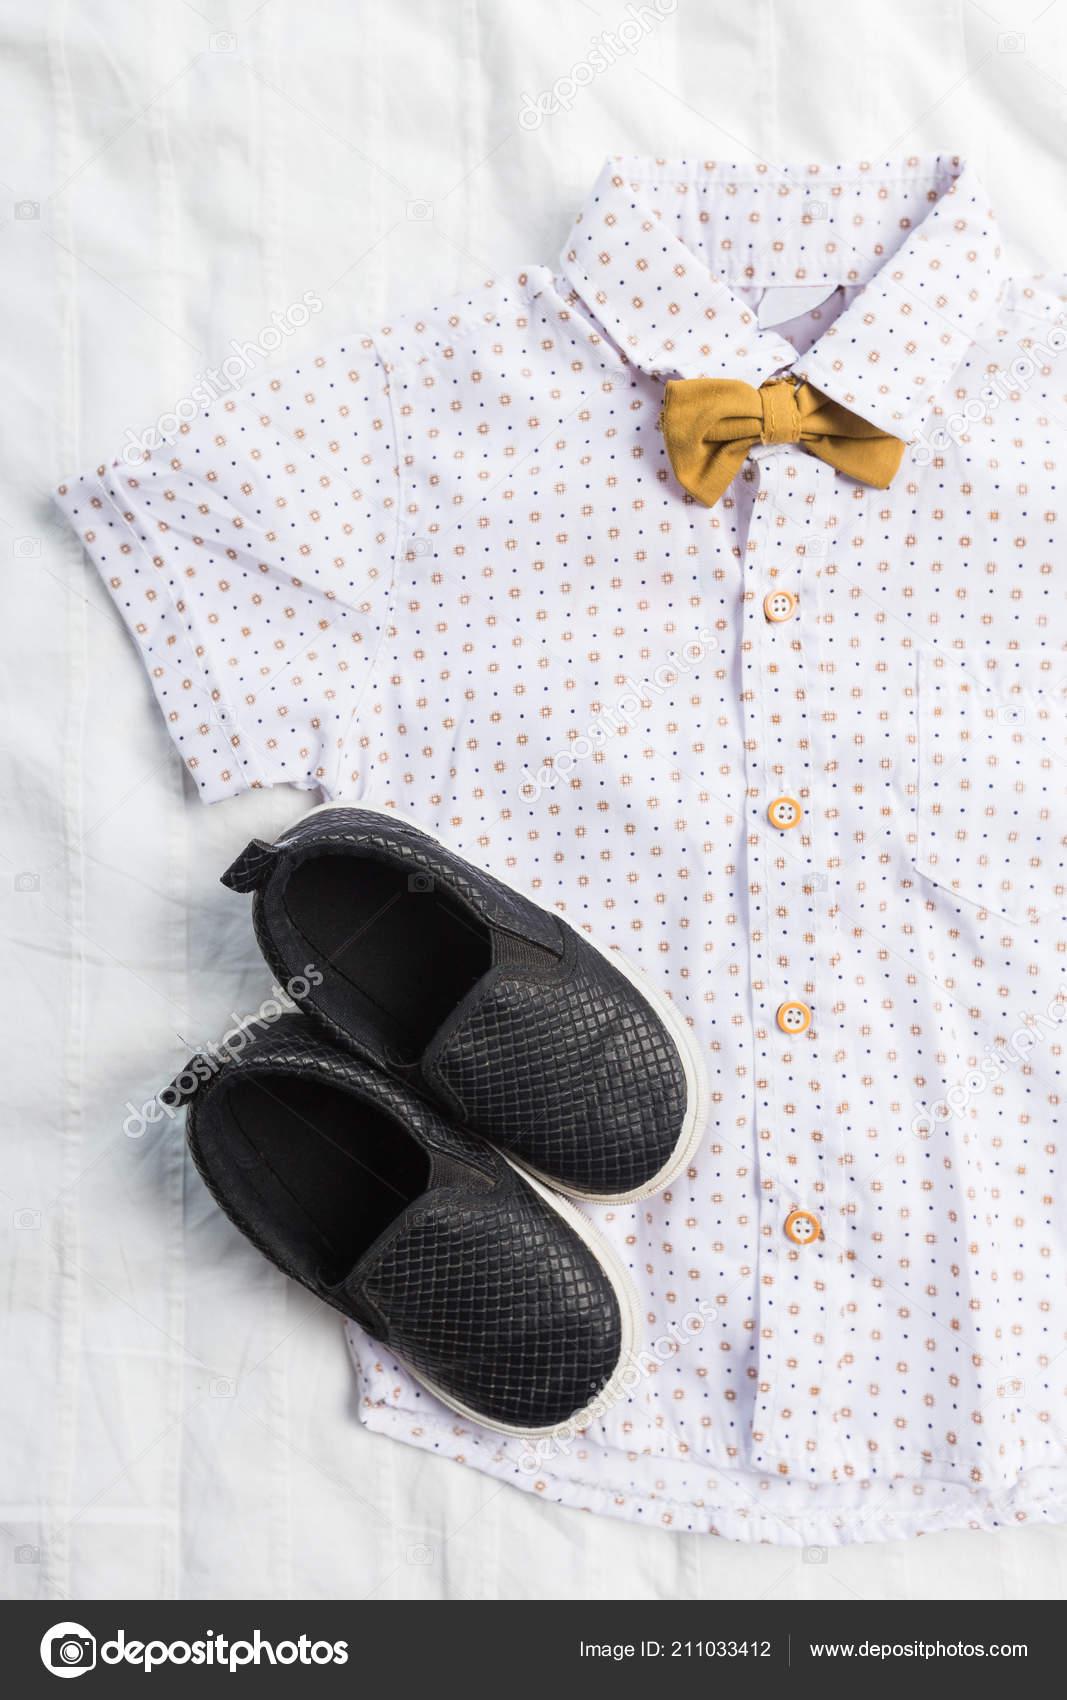 cbda312e1d9 Παιδικά Ρούχα Αγόρι Που Απομονώνονται Λευκό Φόντο Γκρο Πλαν — Φωτογραφία  Αρχείου